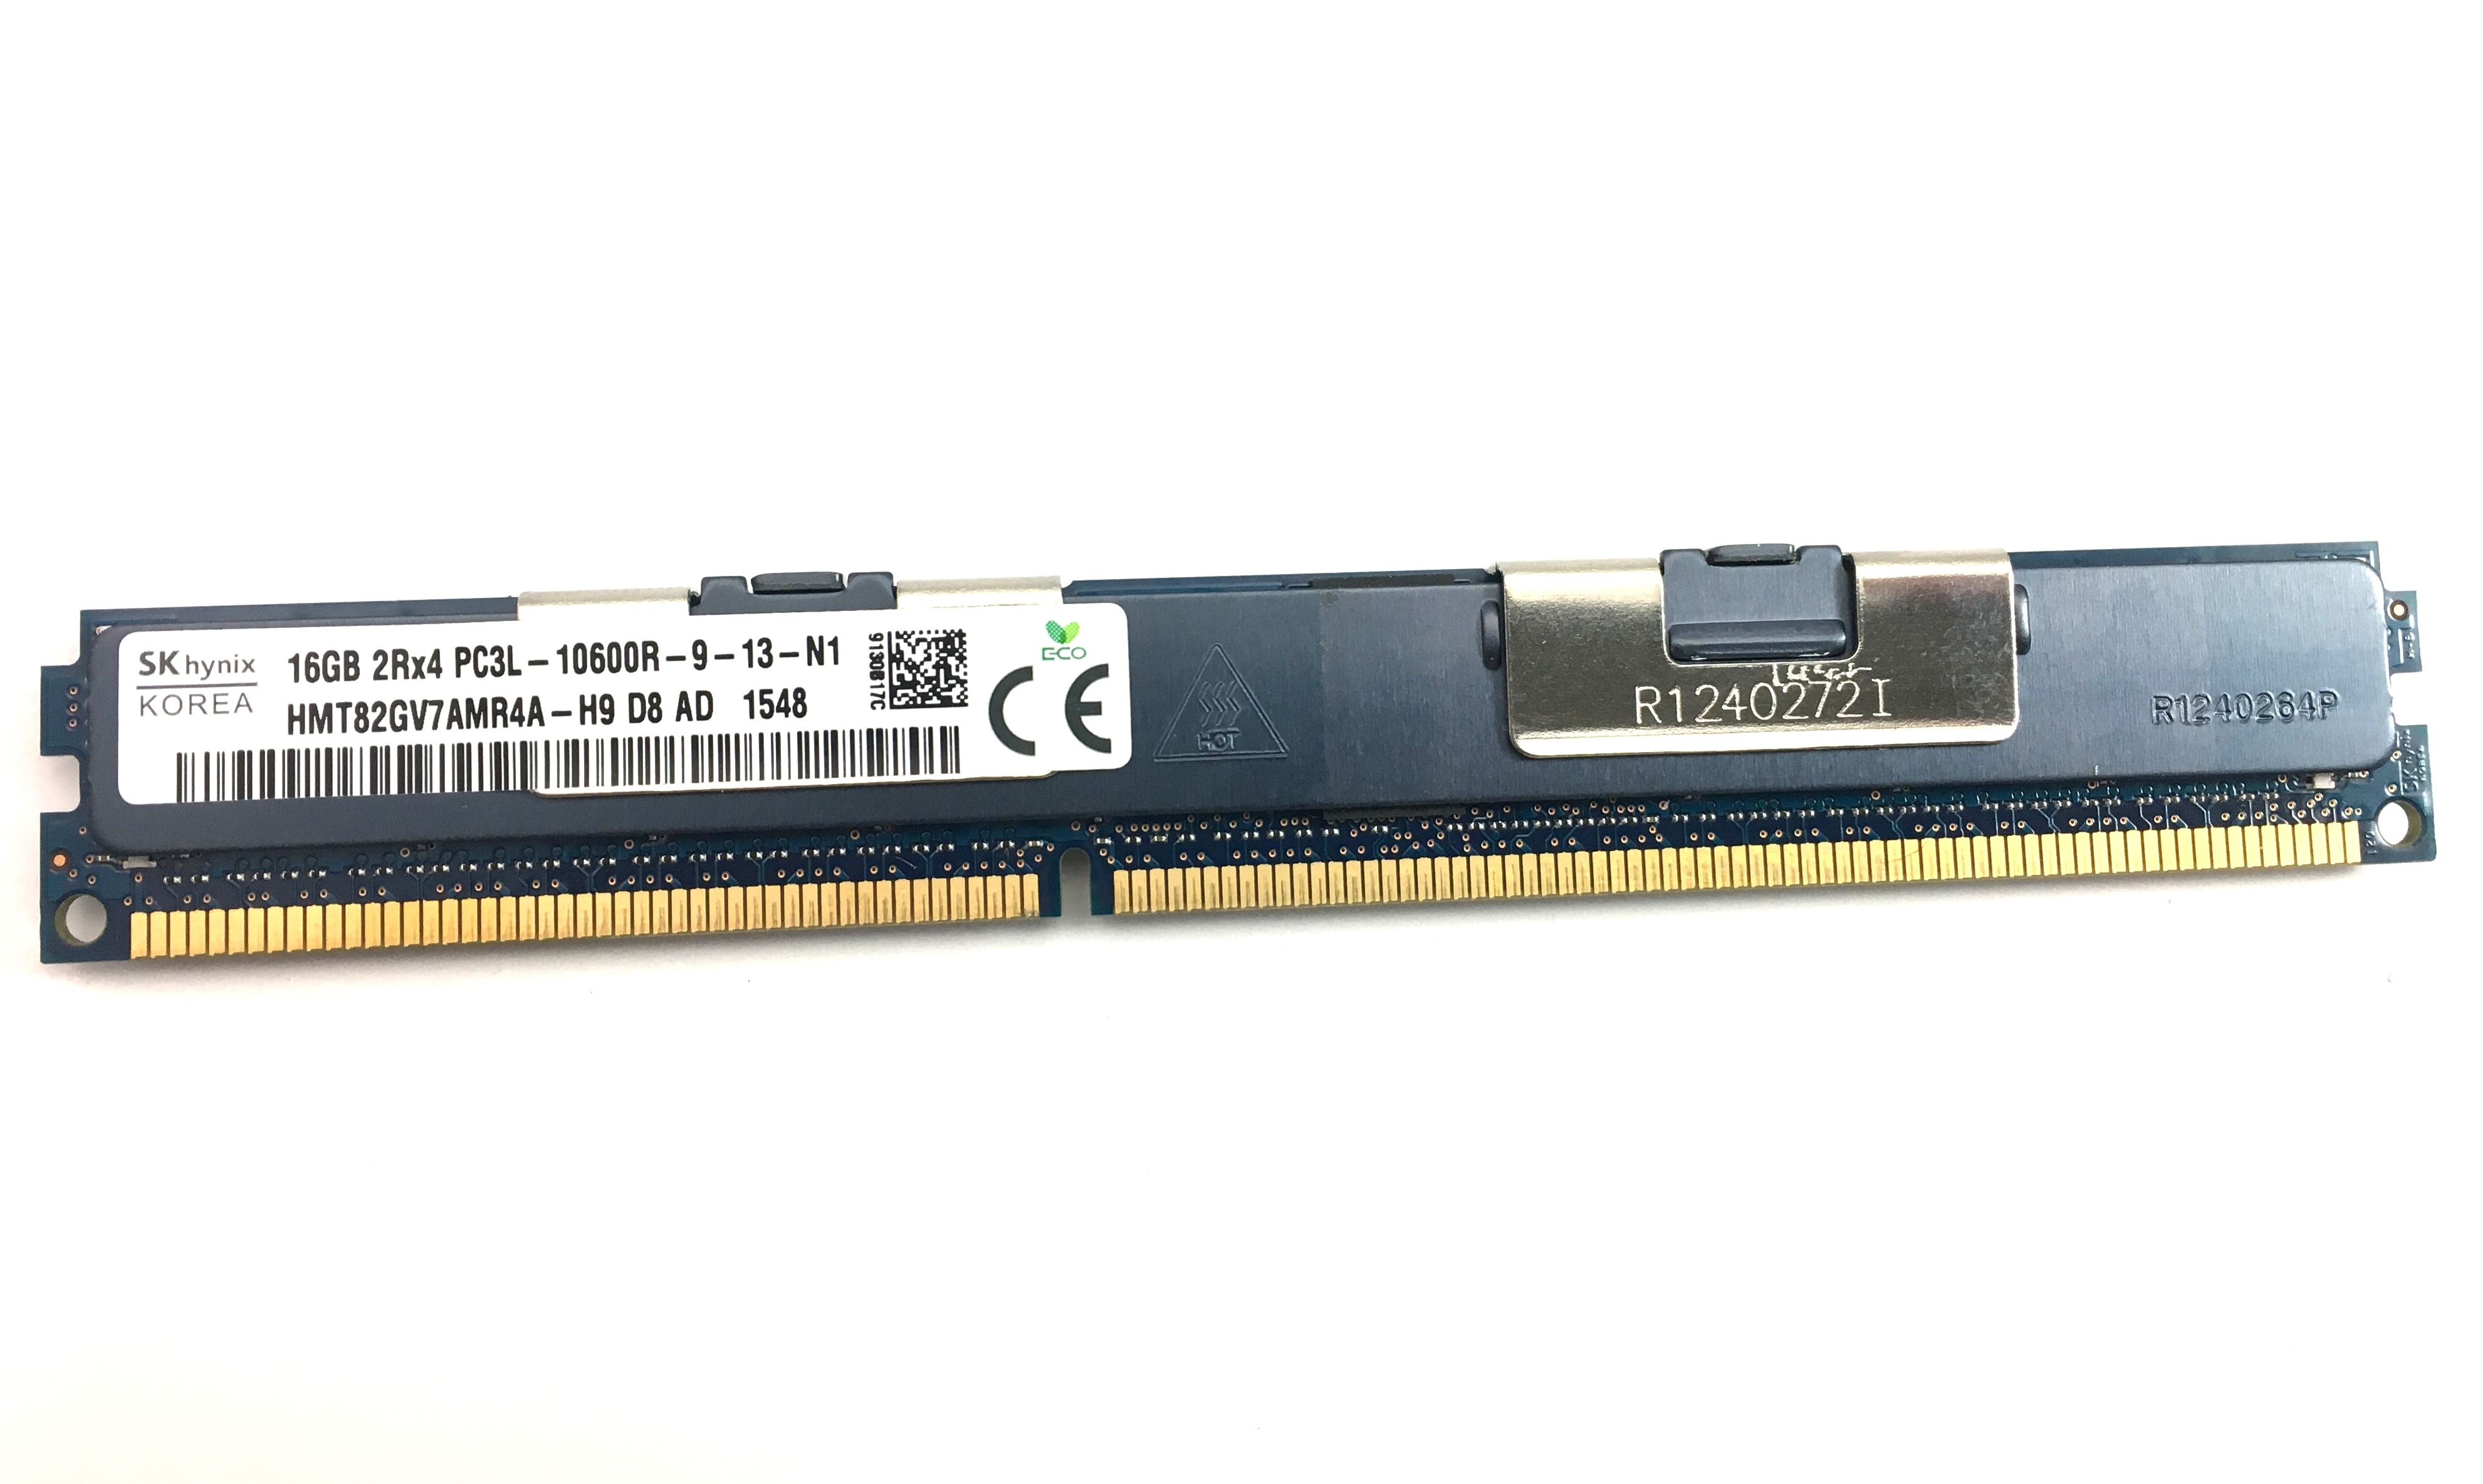 Hynix 16GB 2Rx4 PC3L-10600R DDR3 1333MHz ECC REG VLP Memory (HMT82GV7AMR4A-H9)